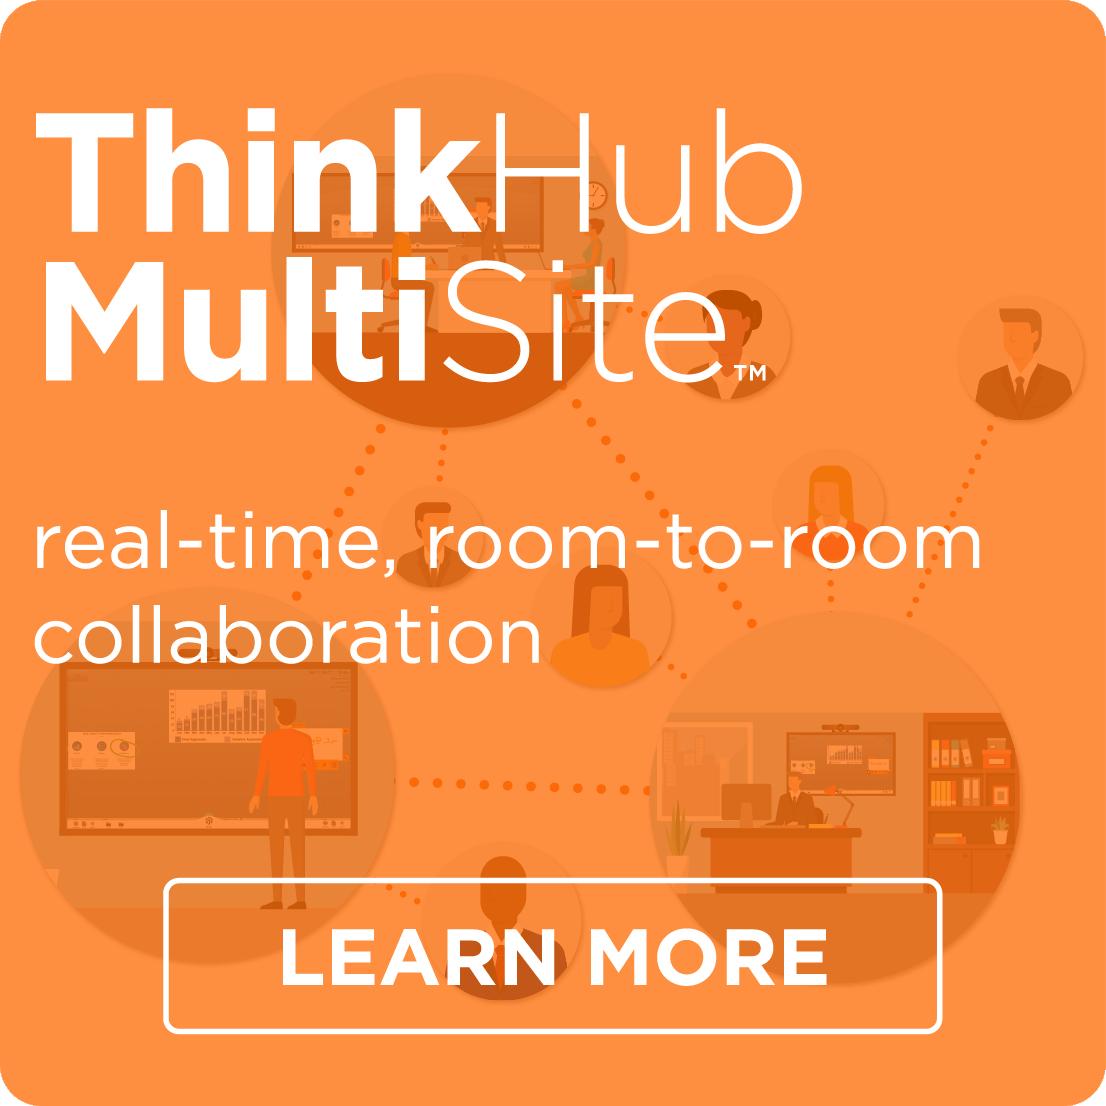 thinkhub multisite card